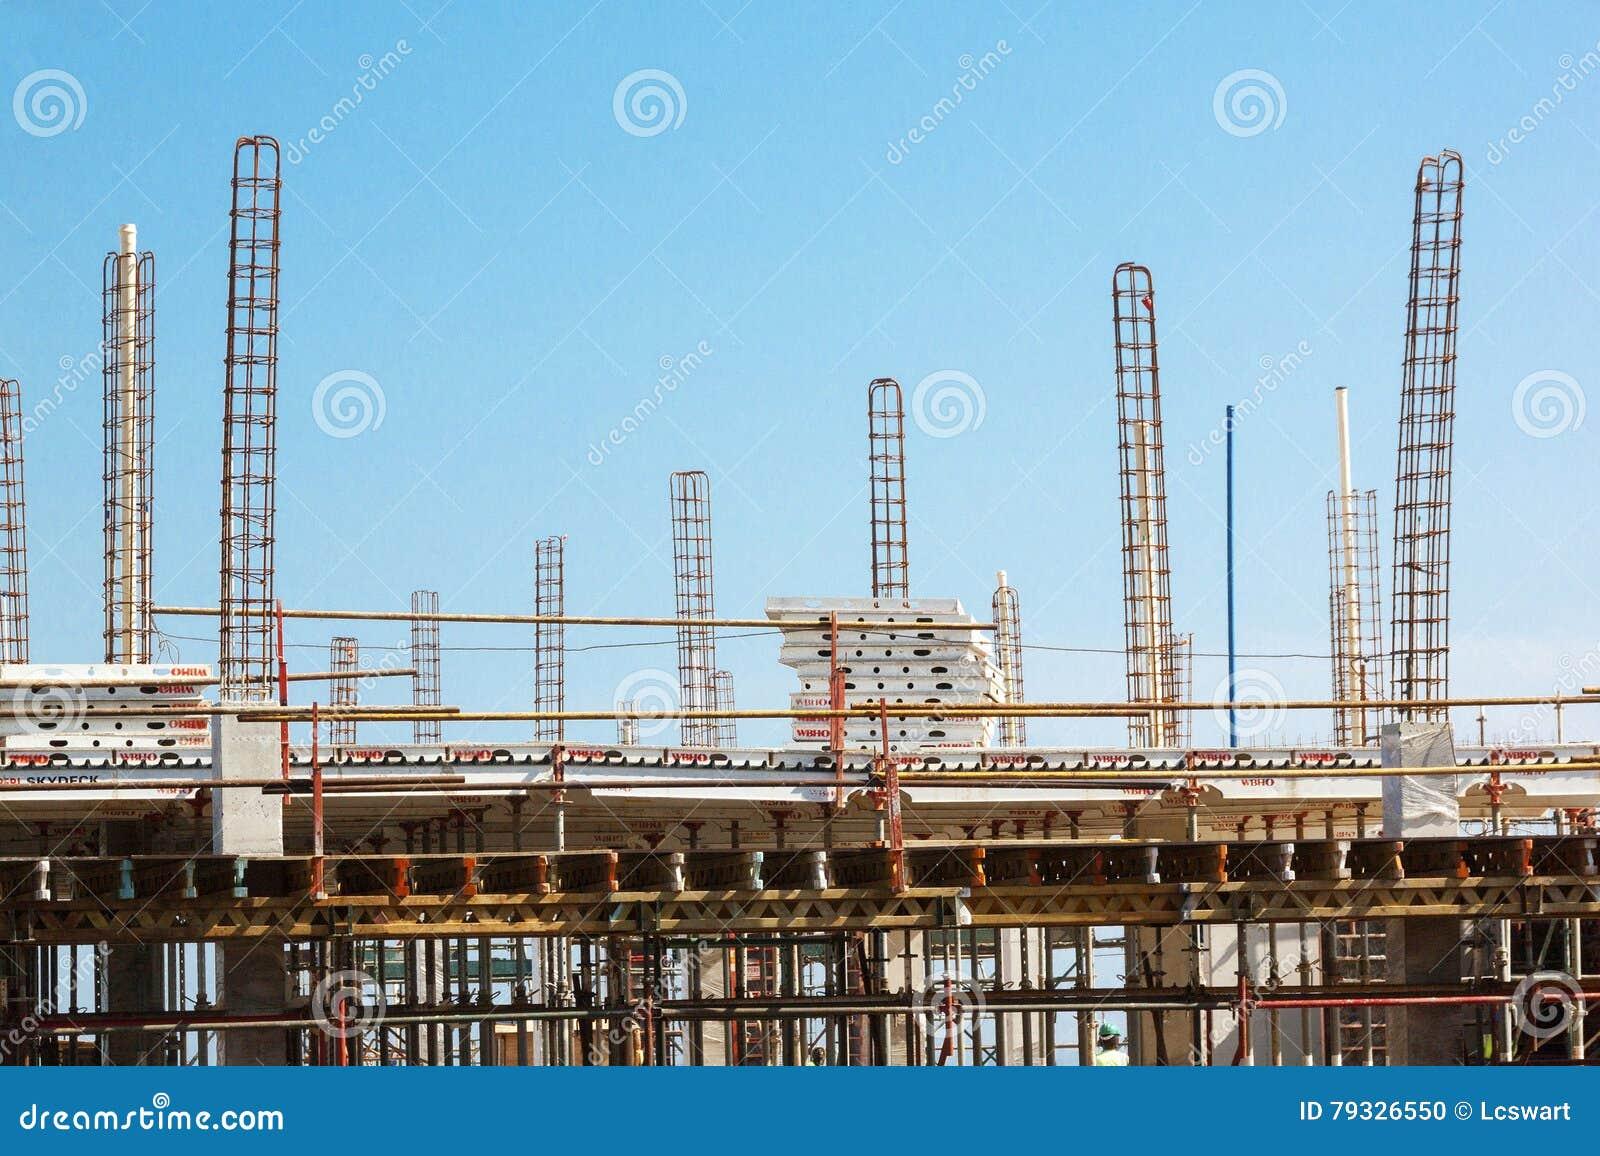 High lift Crane Woking on Construction Site